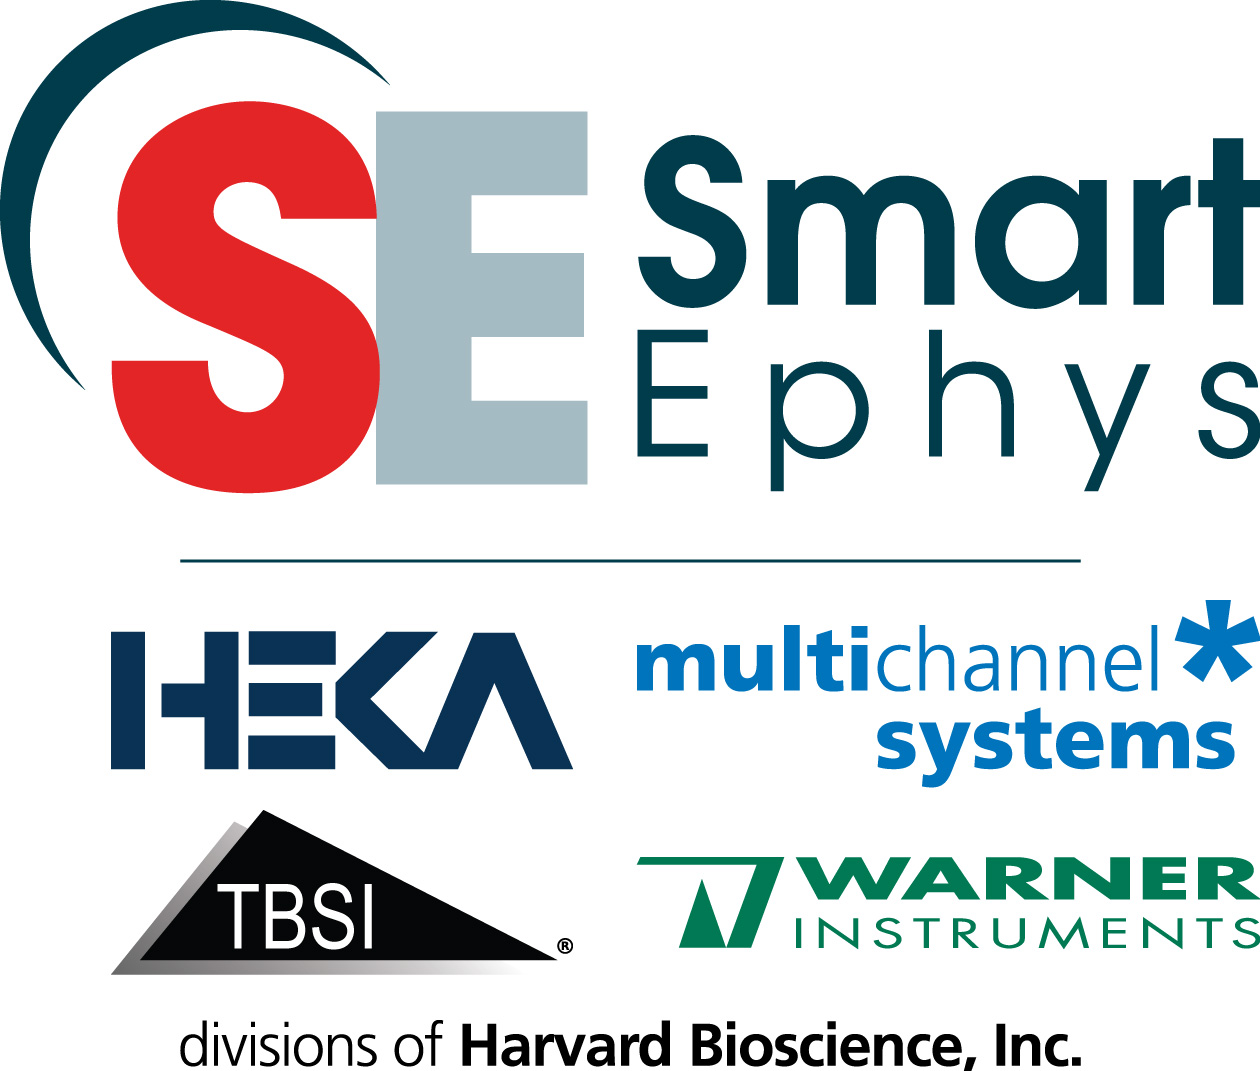 SmartEphys-Brands-Logo.jpg